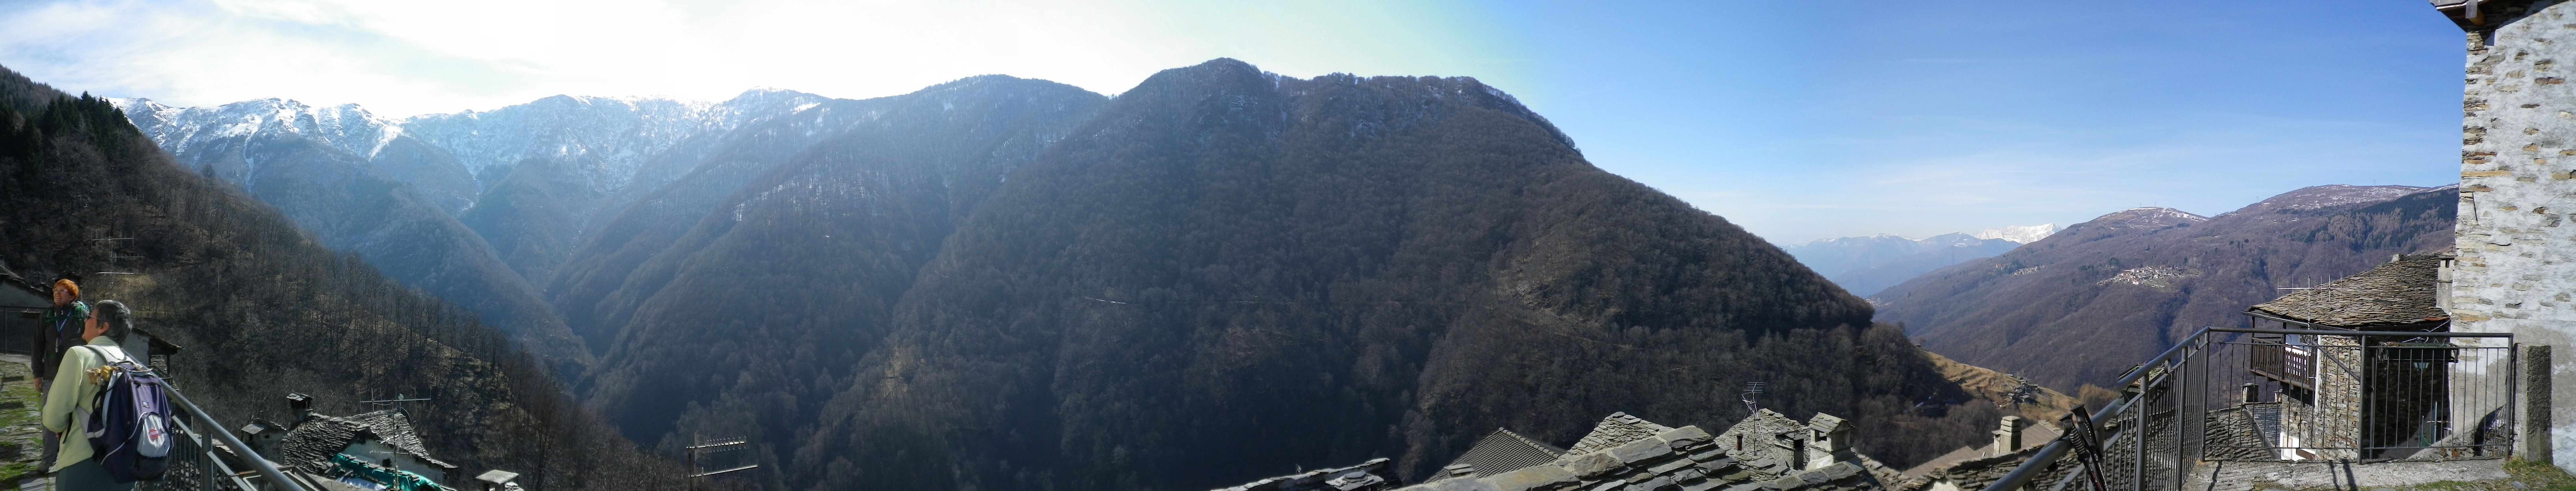 Monteviasco - Trekking